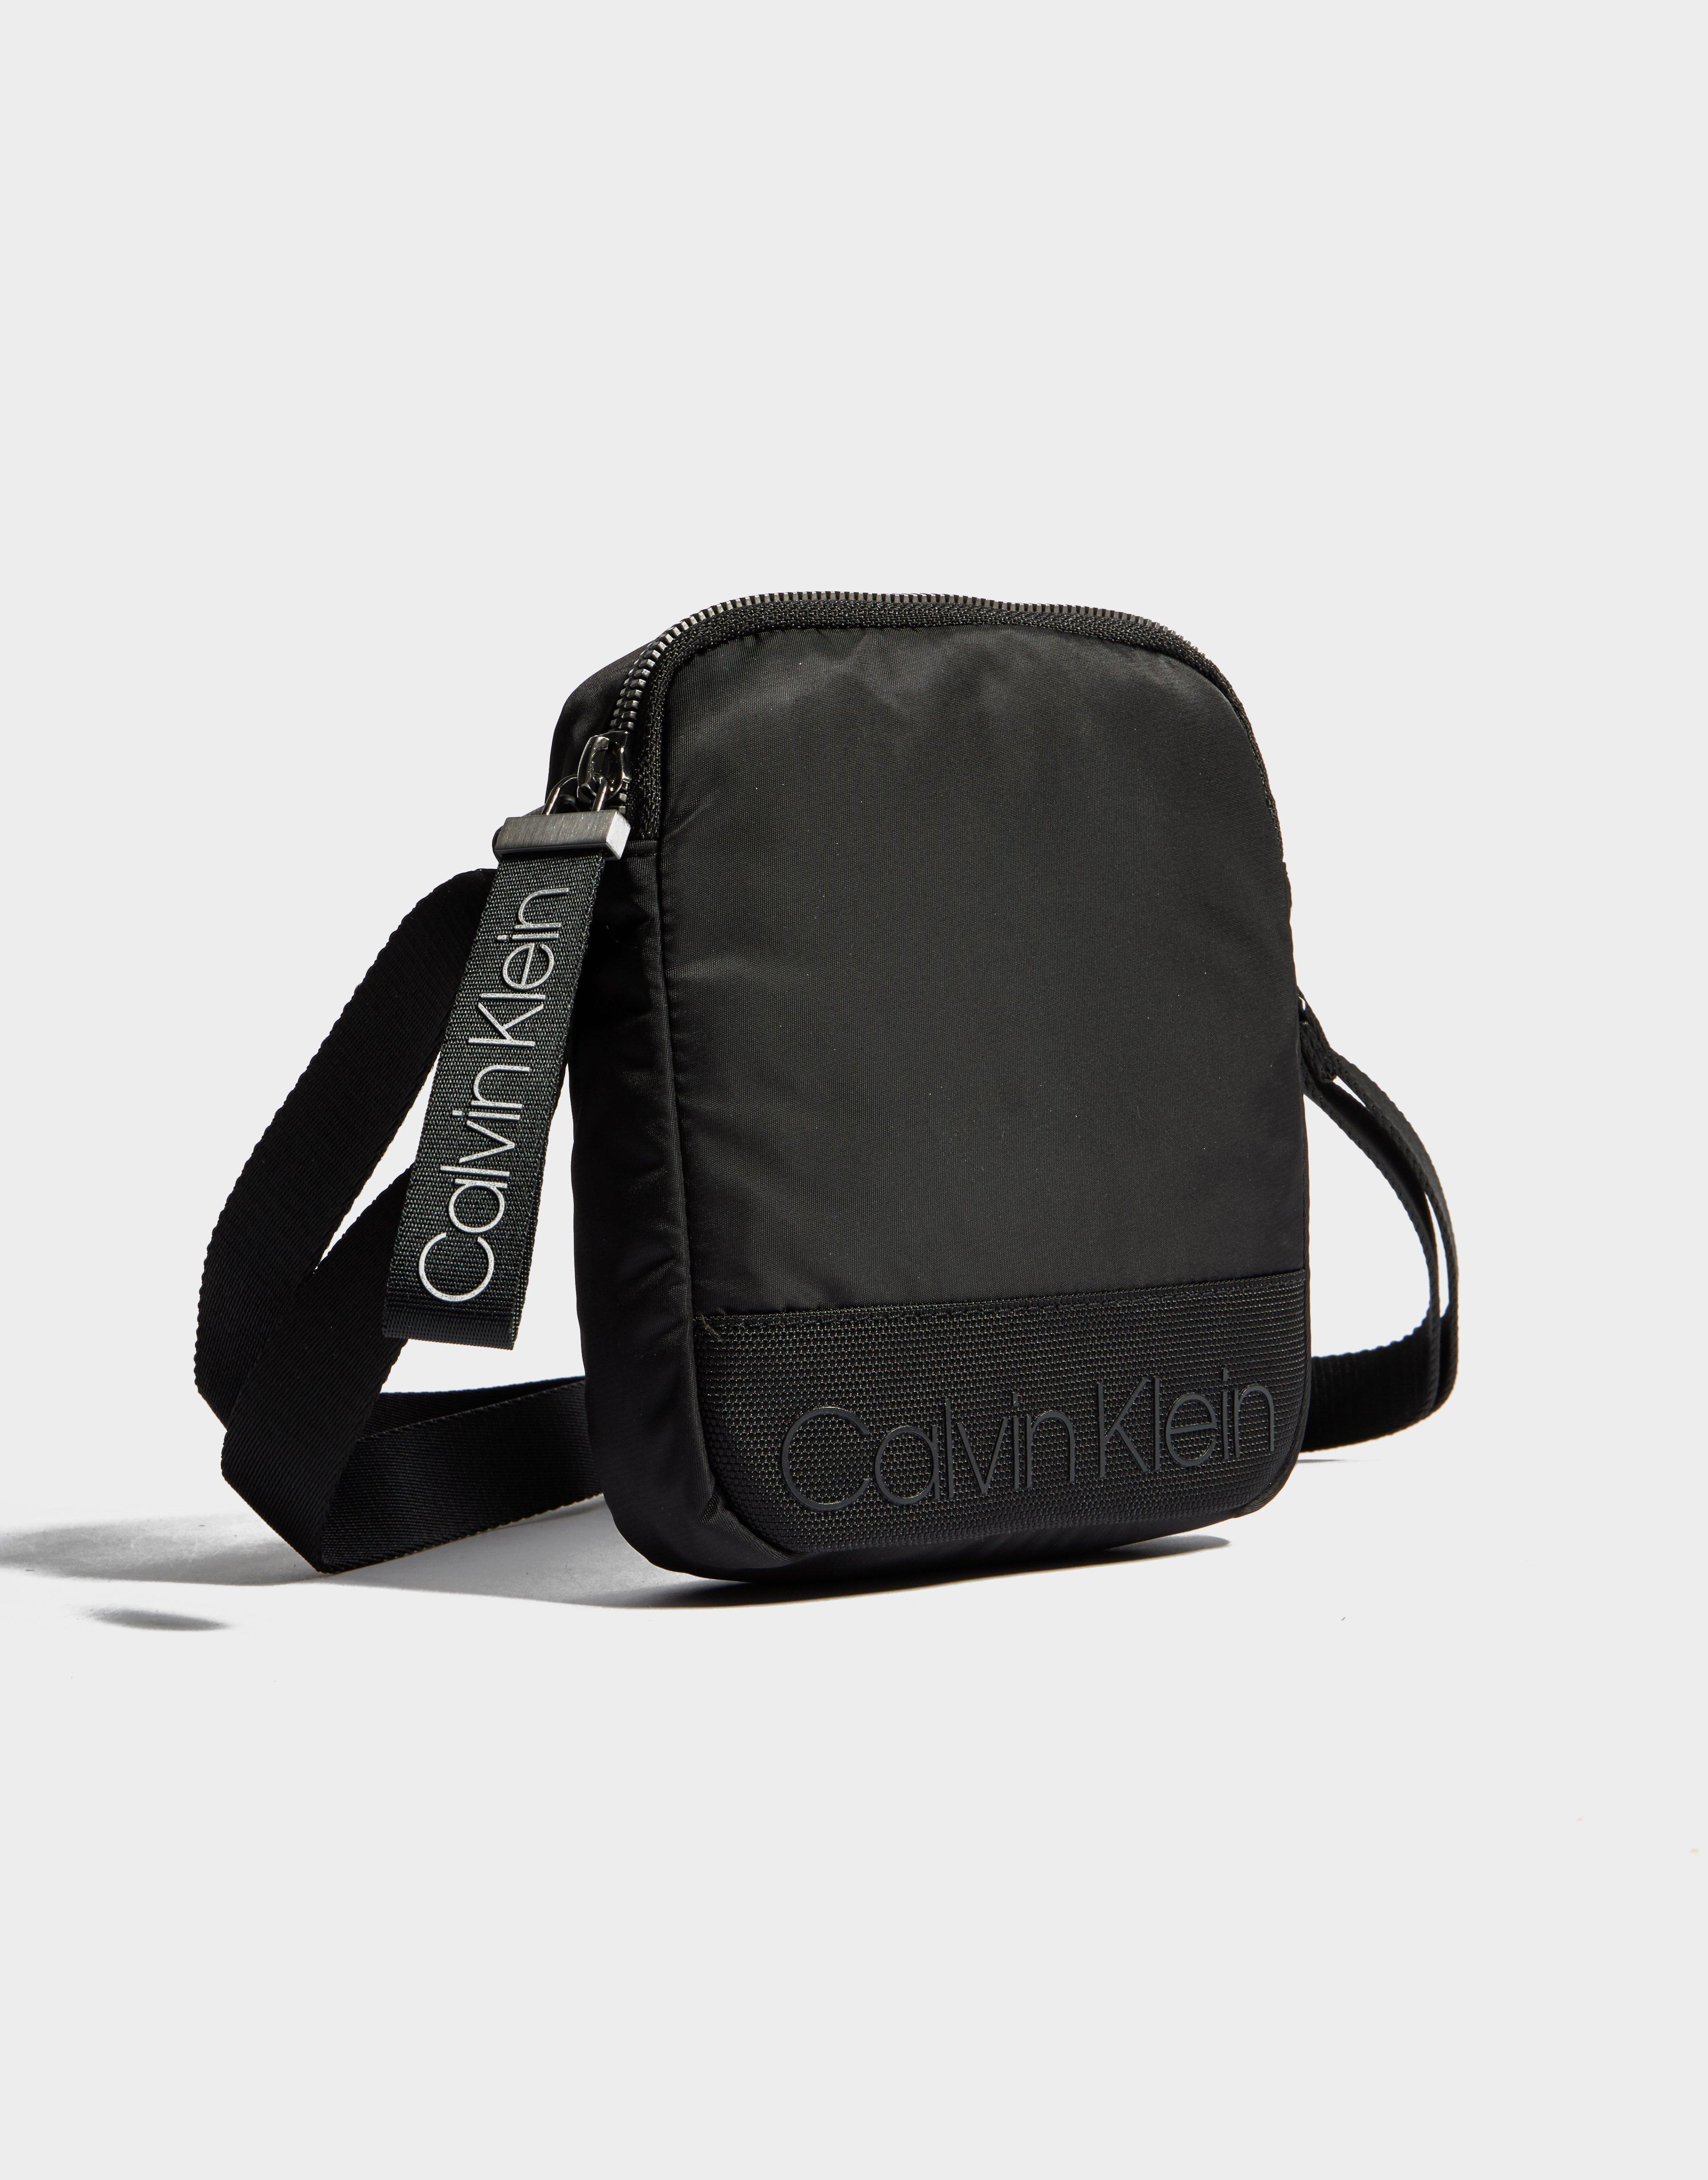 4ab0b8b450 Calvin Klein Mini Crossbody Bag in Black for Men - Lyst